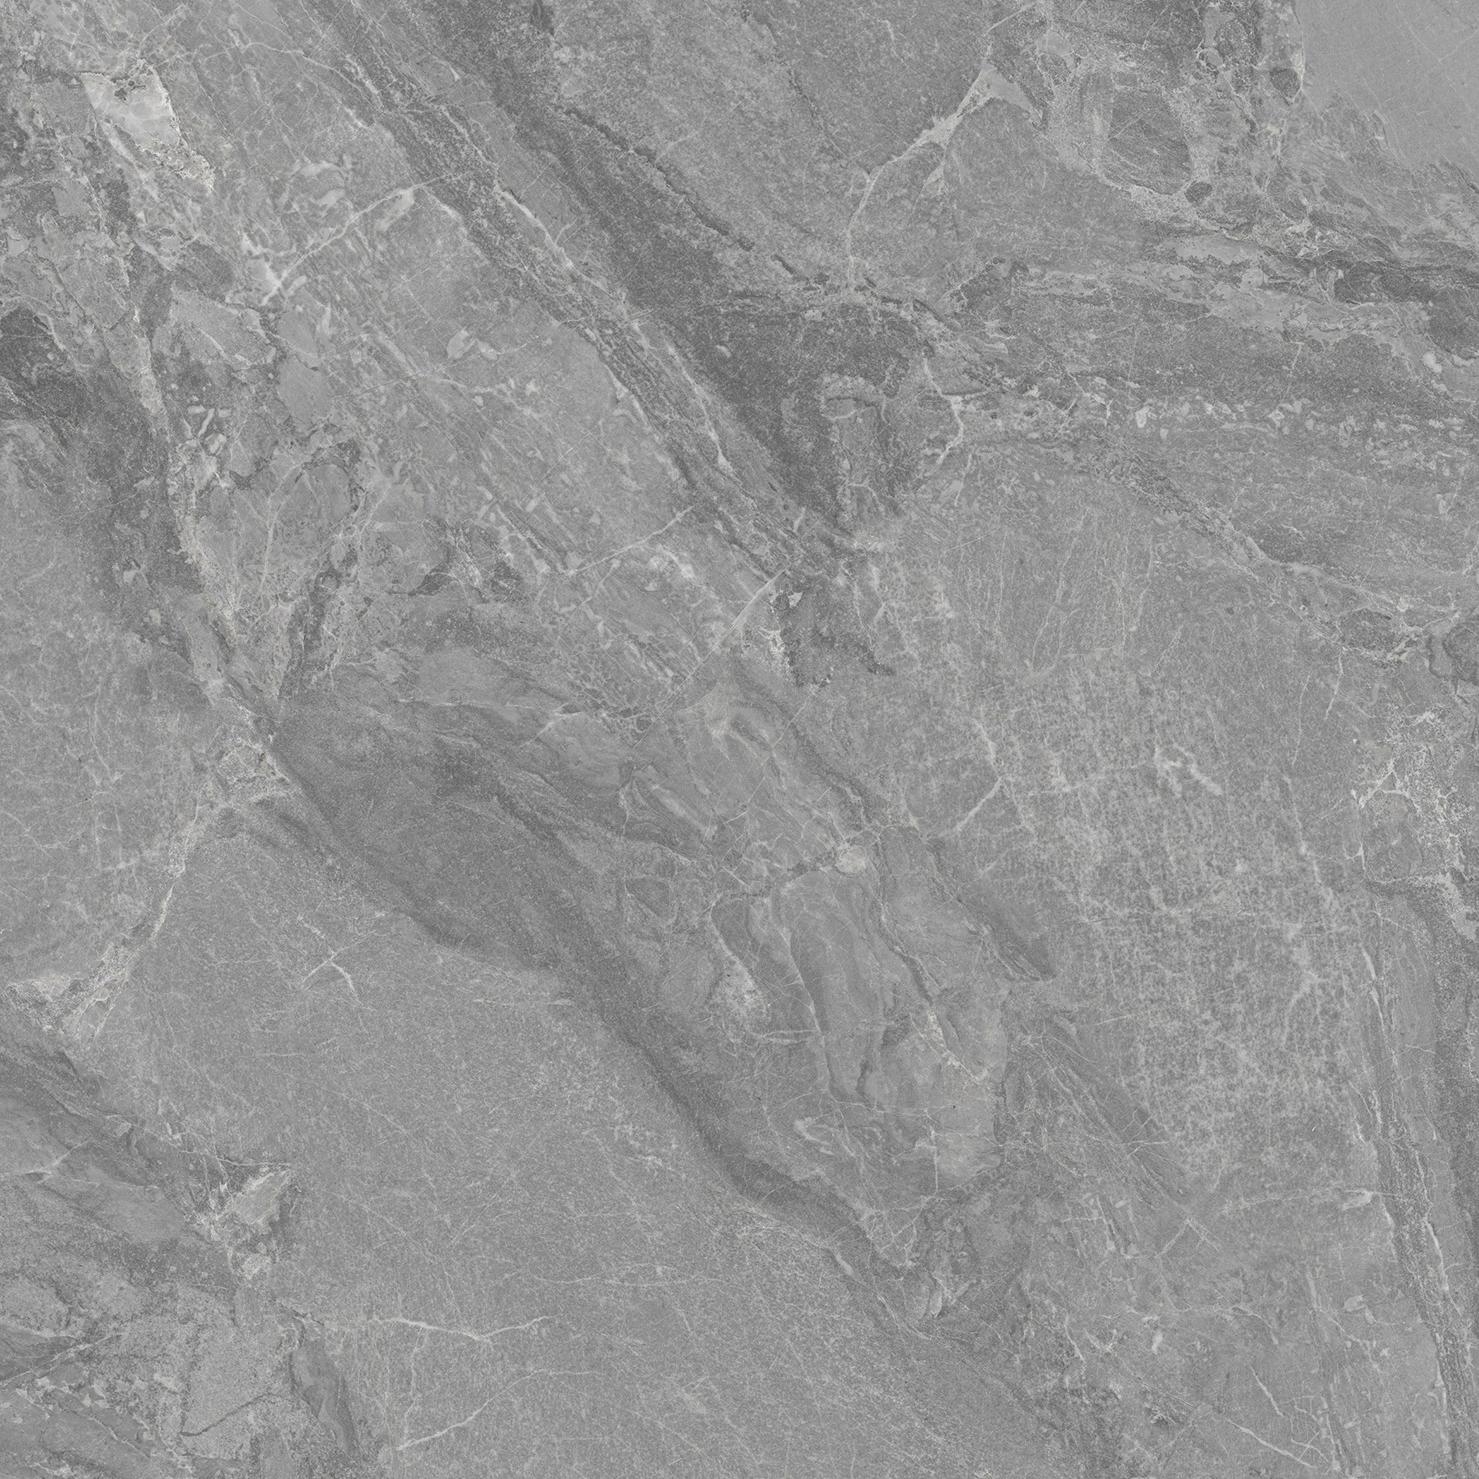 科伦娜深灰HPG80181,800x800mm;HPG26181,600x1200mm